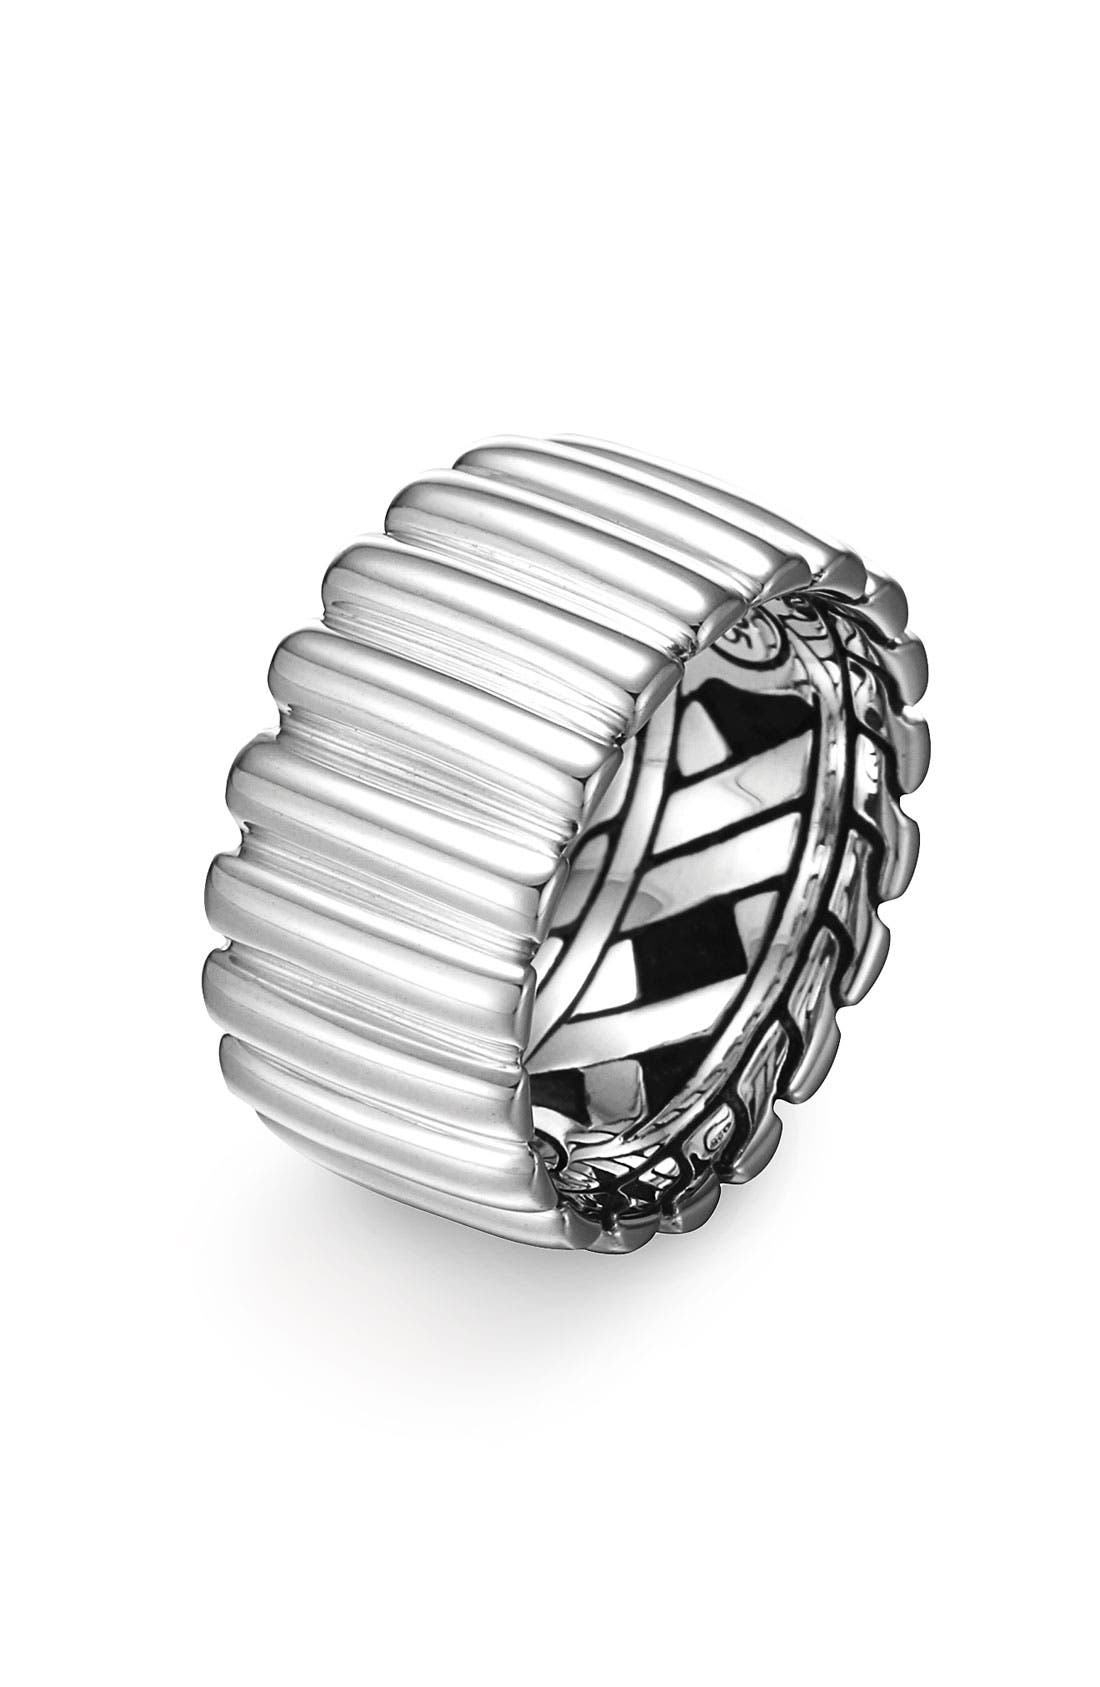 Main Image - John Hardy 'Bedeg' Wide Band Ring